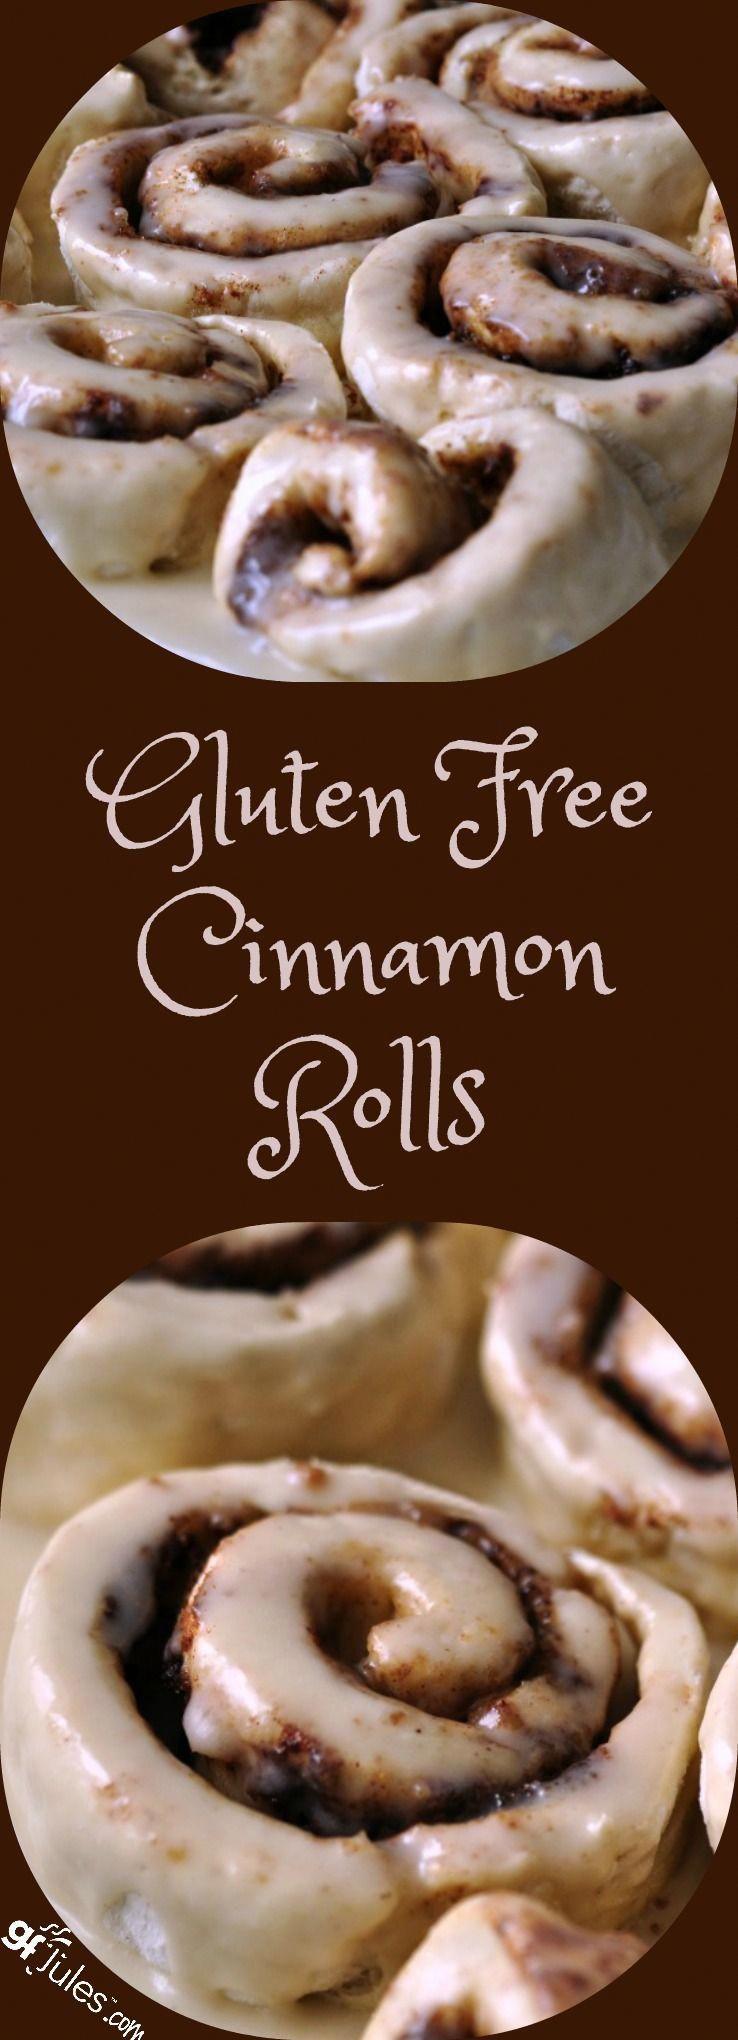 Gluten Free Soda Bread Amazing Gluten Free Recipes